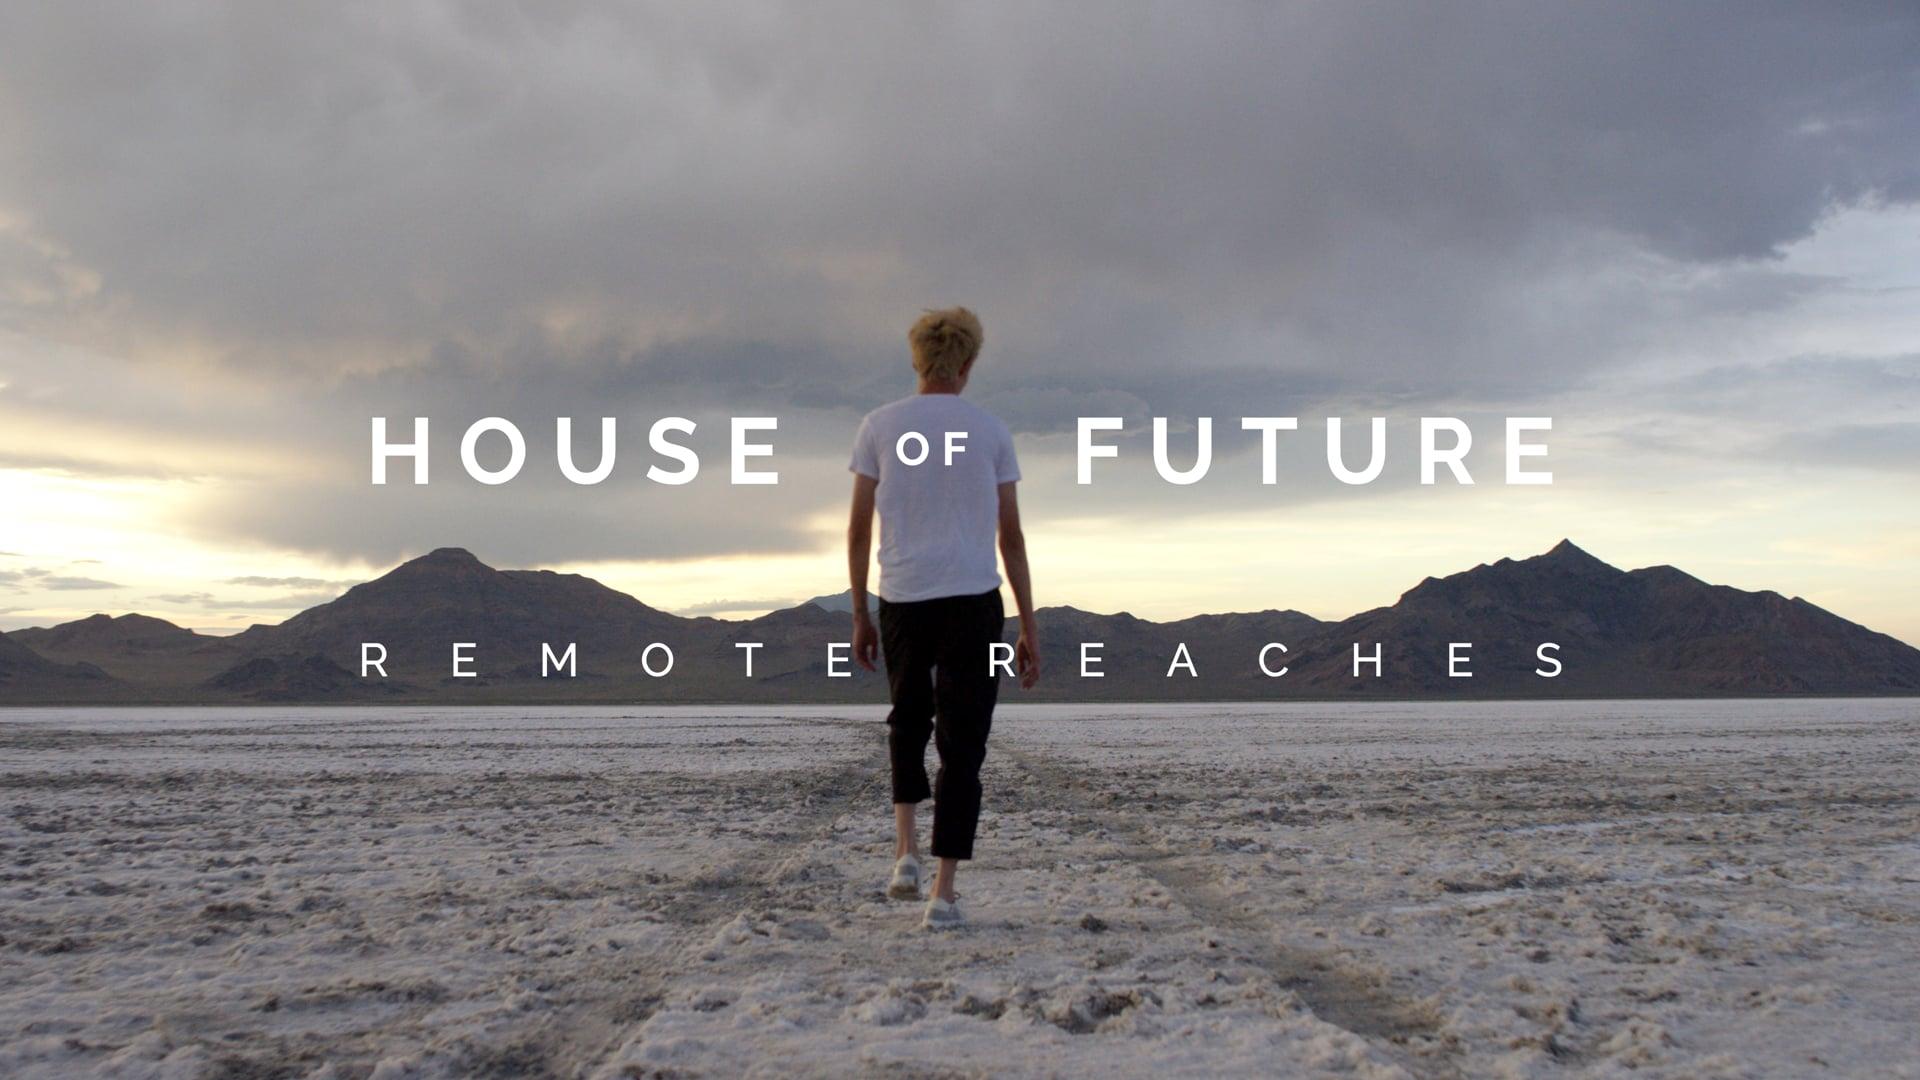 House of Future - Remote Reaches